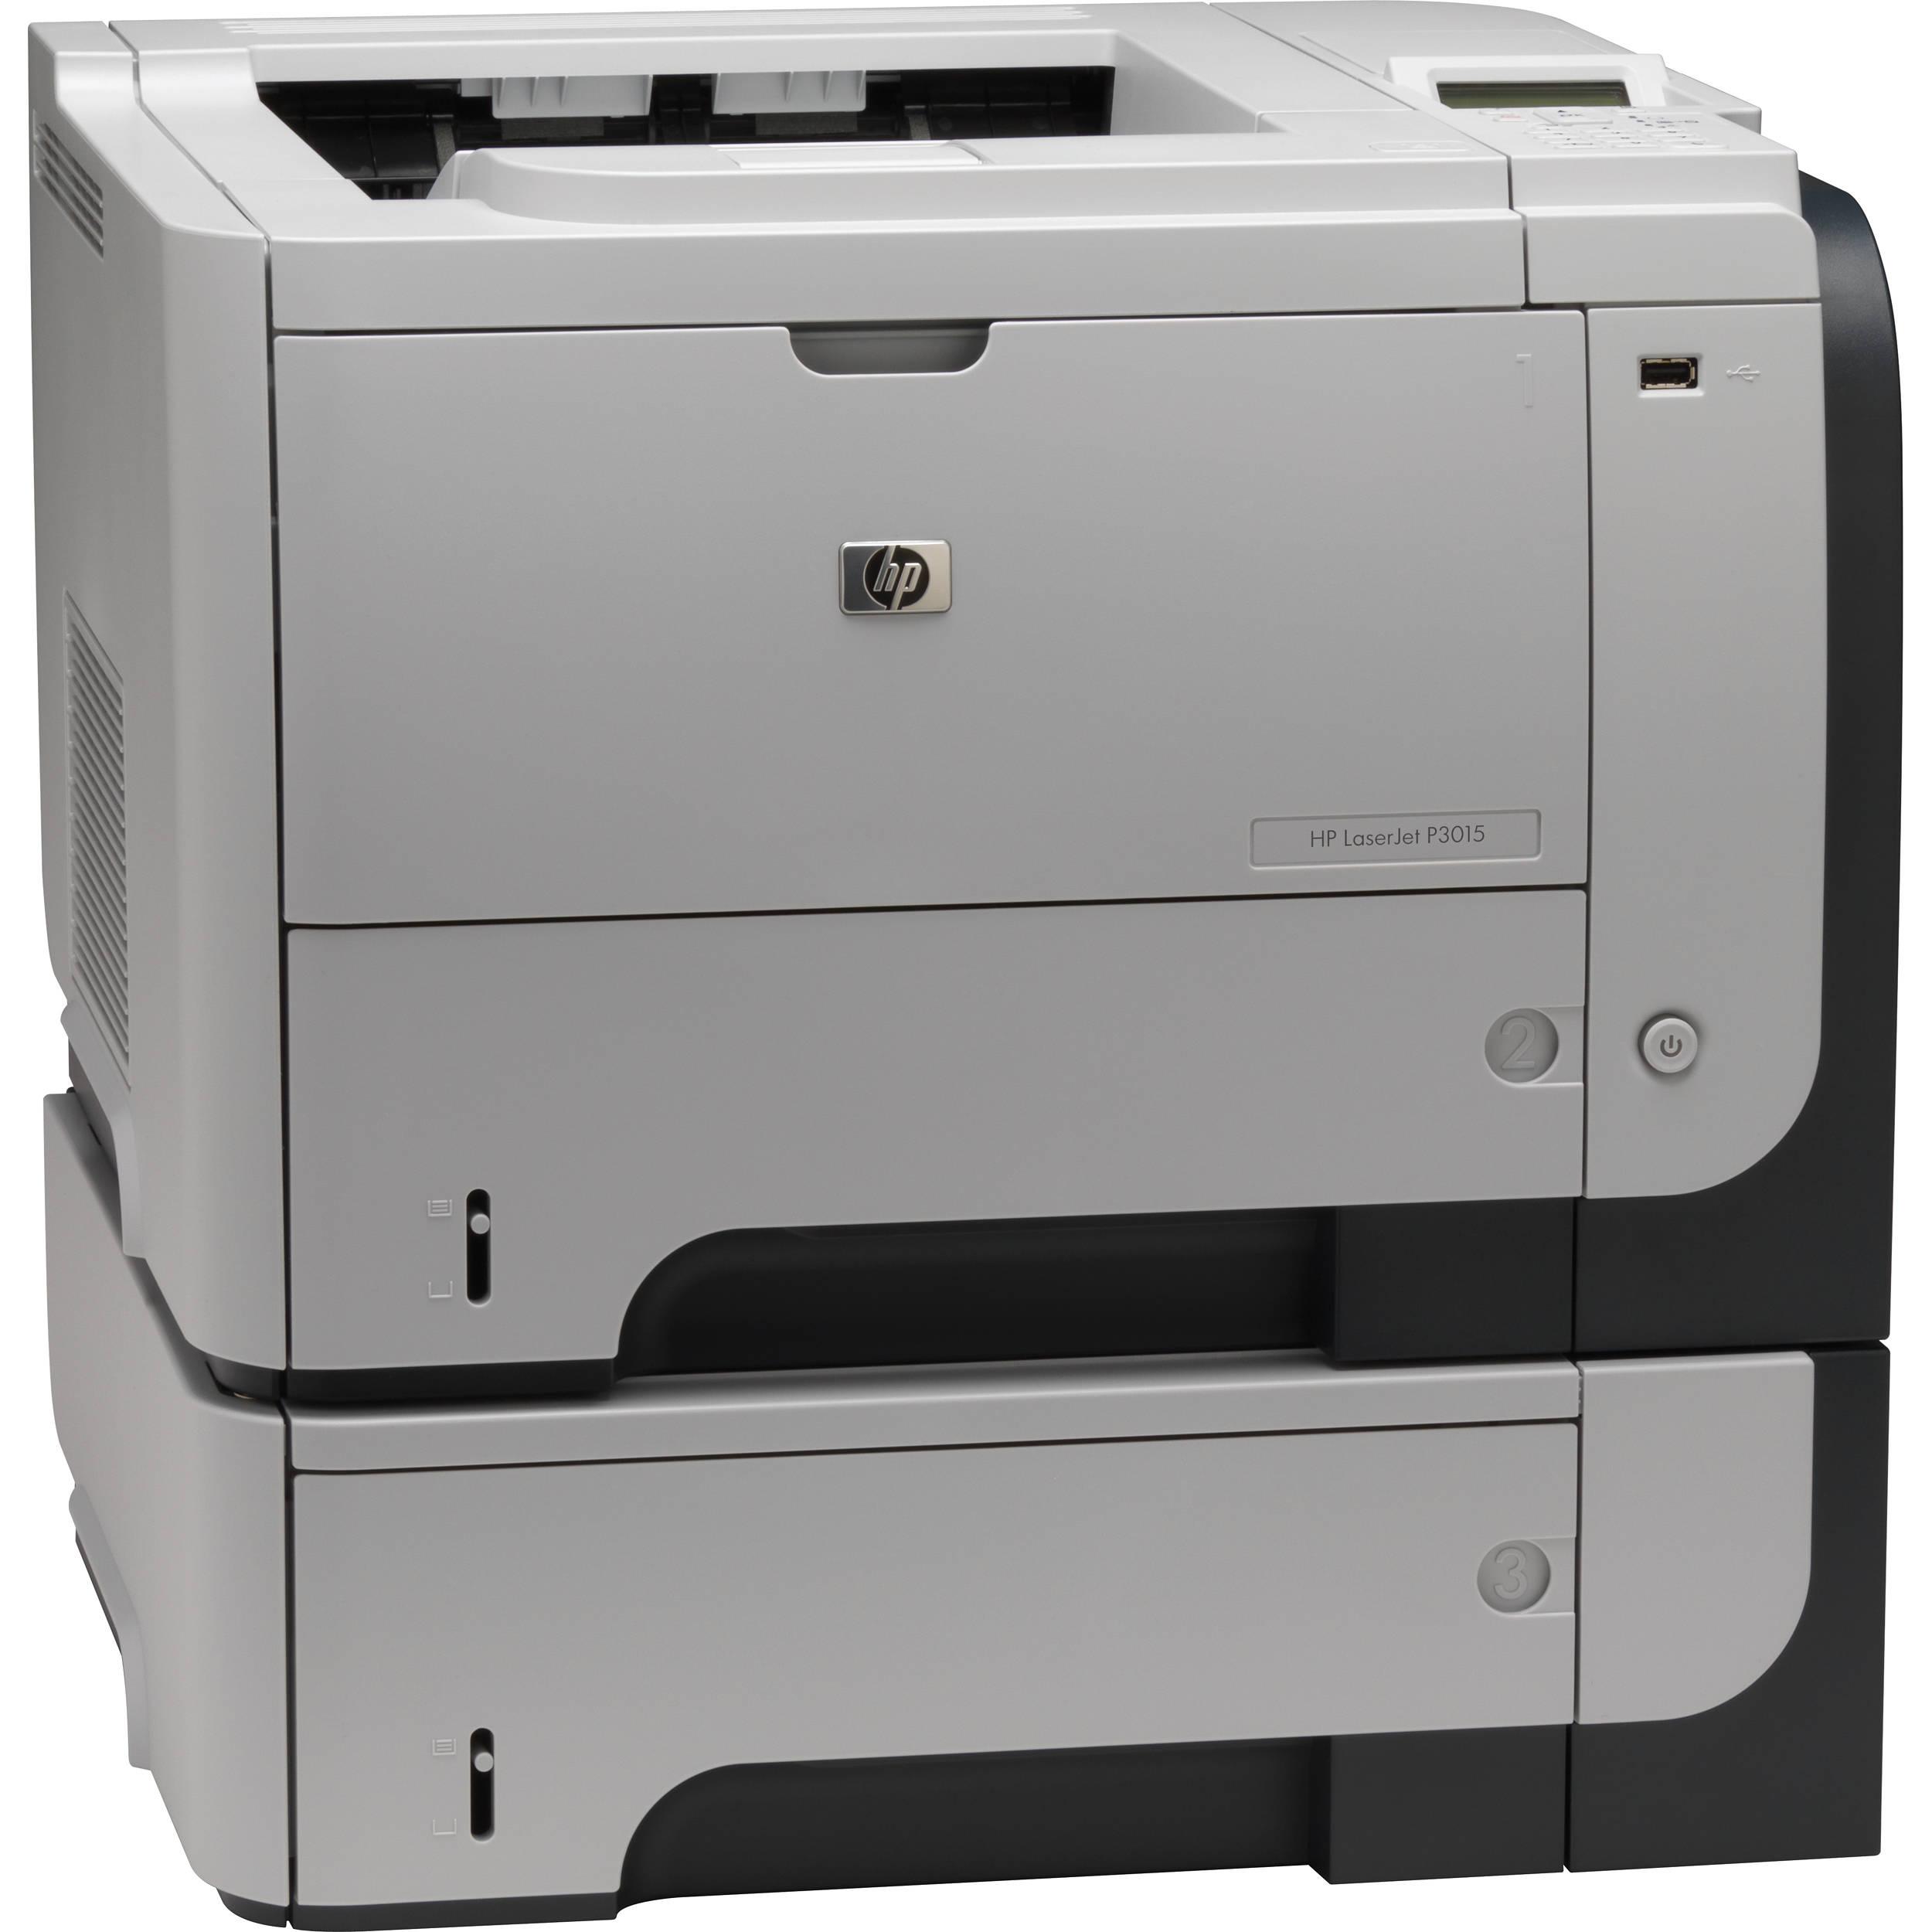 AIM Refurbish - LaserJet Enterprise P3015X Laser Printer (AIMCE529A)